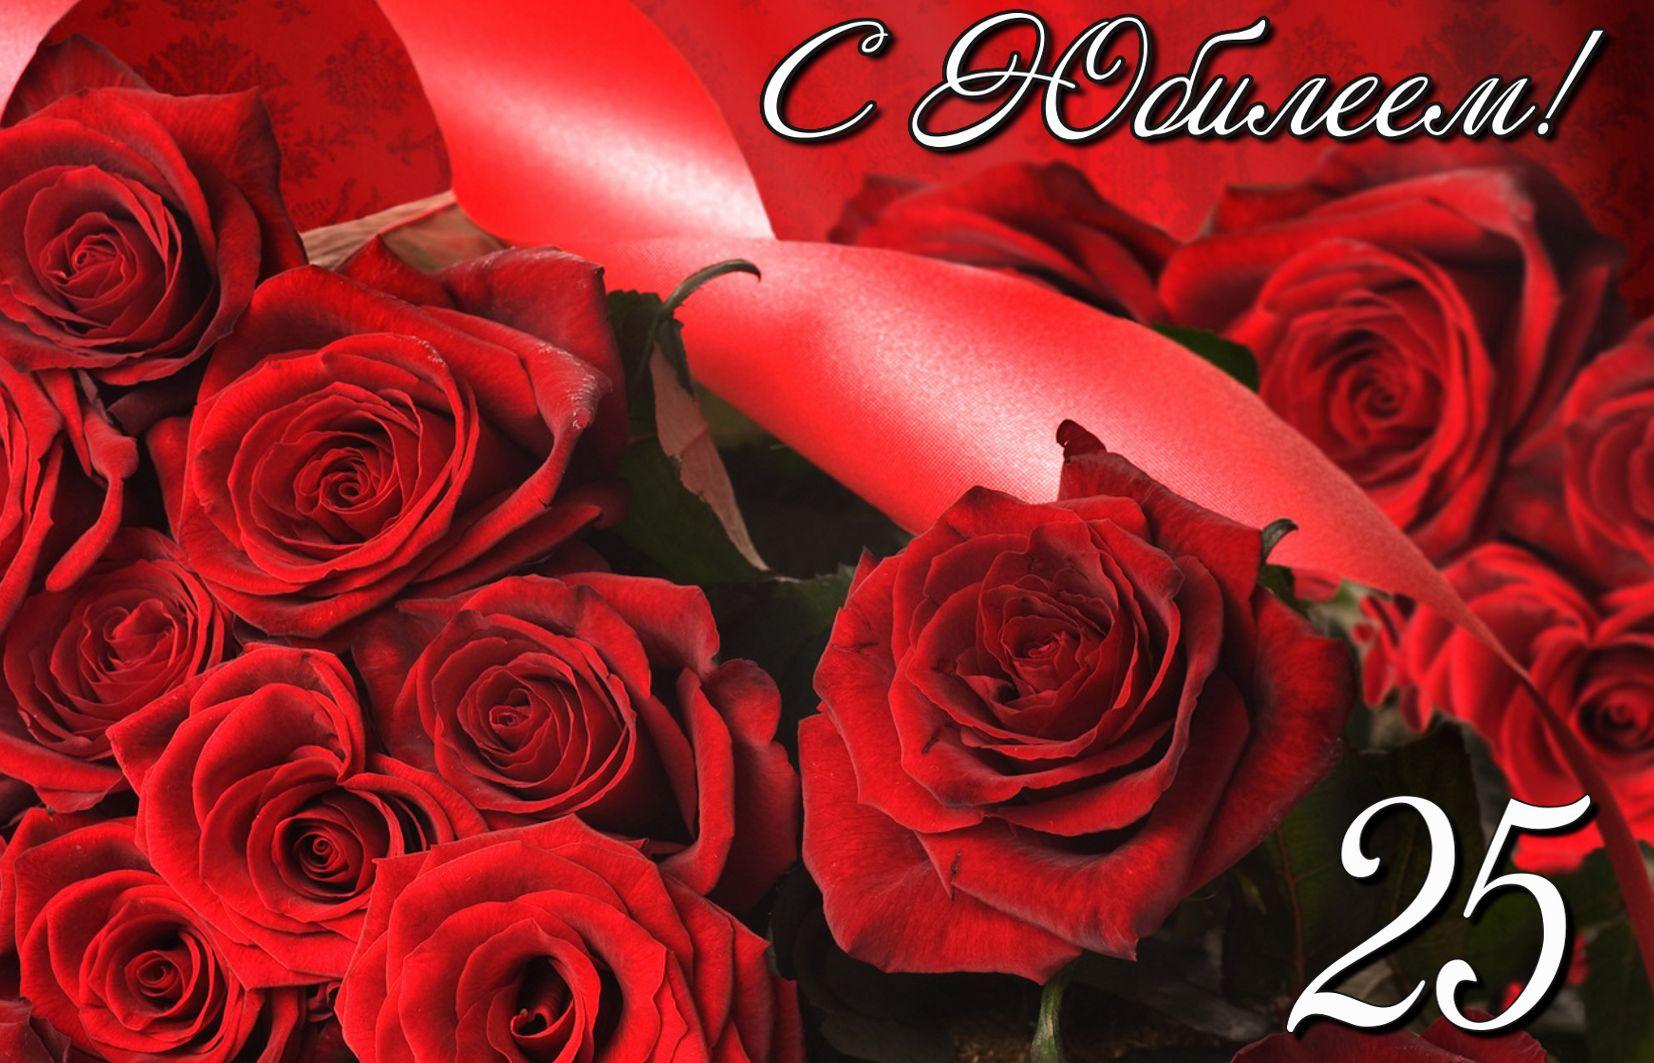 Открытка с розами на красном фоне - на юбилей 25 лет